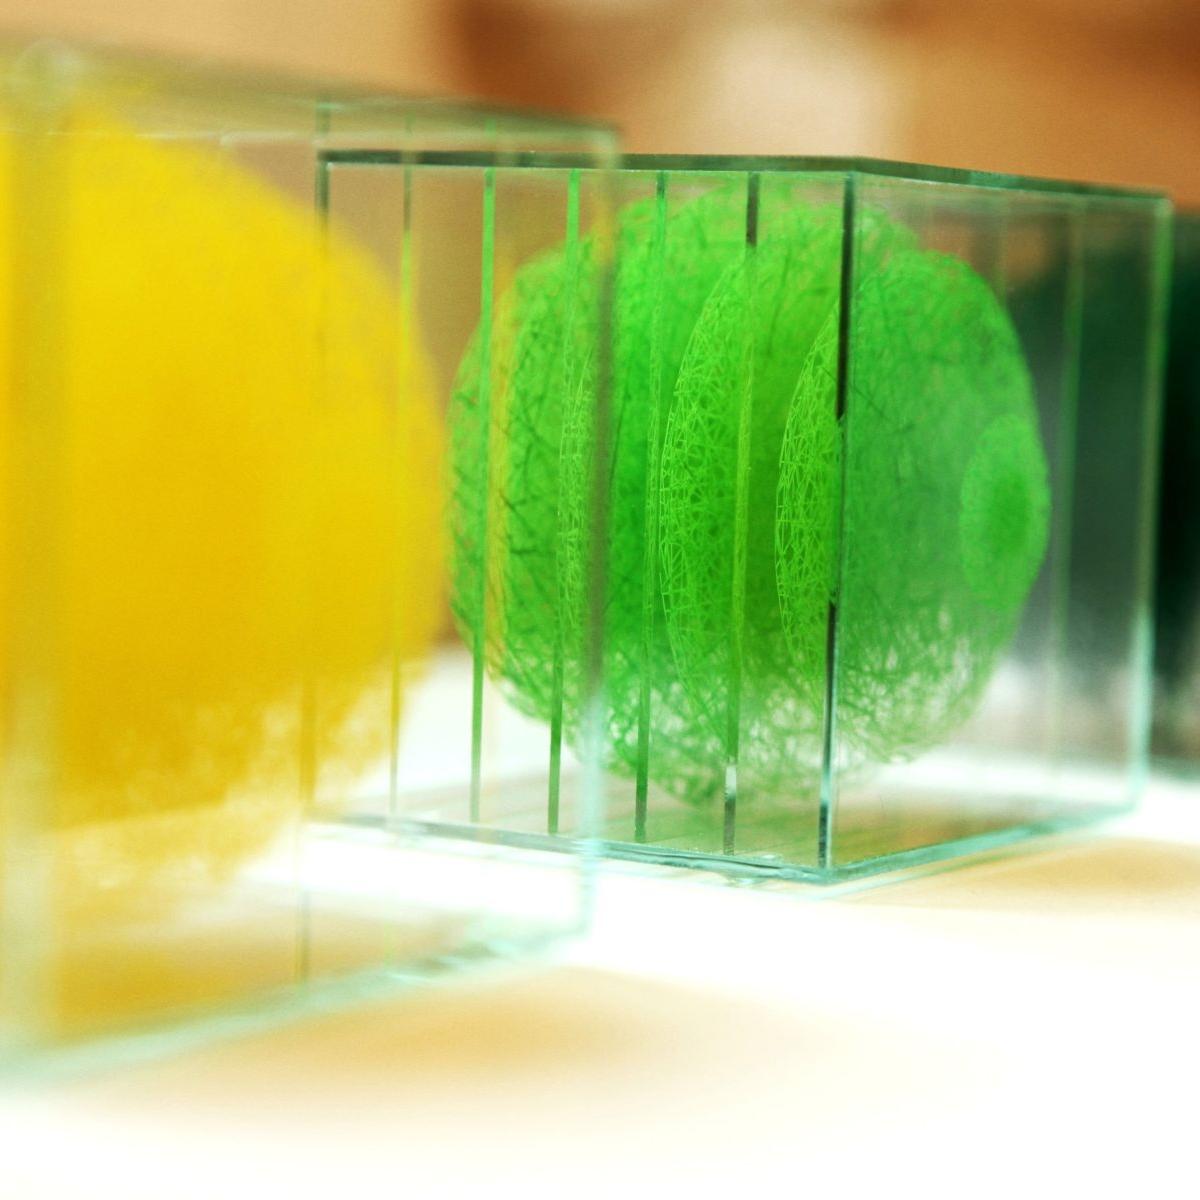 monyalos-jaune-vert. Sébastien Créteur